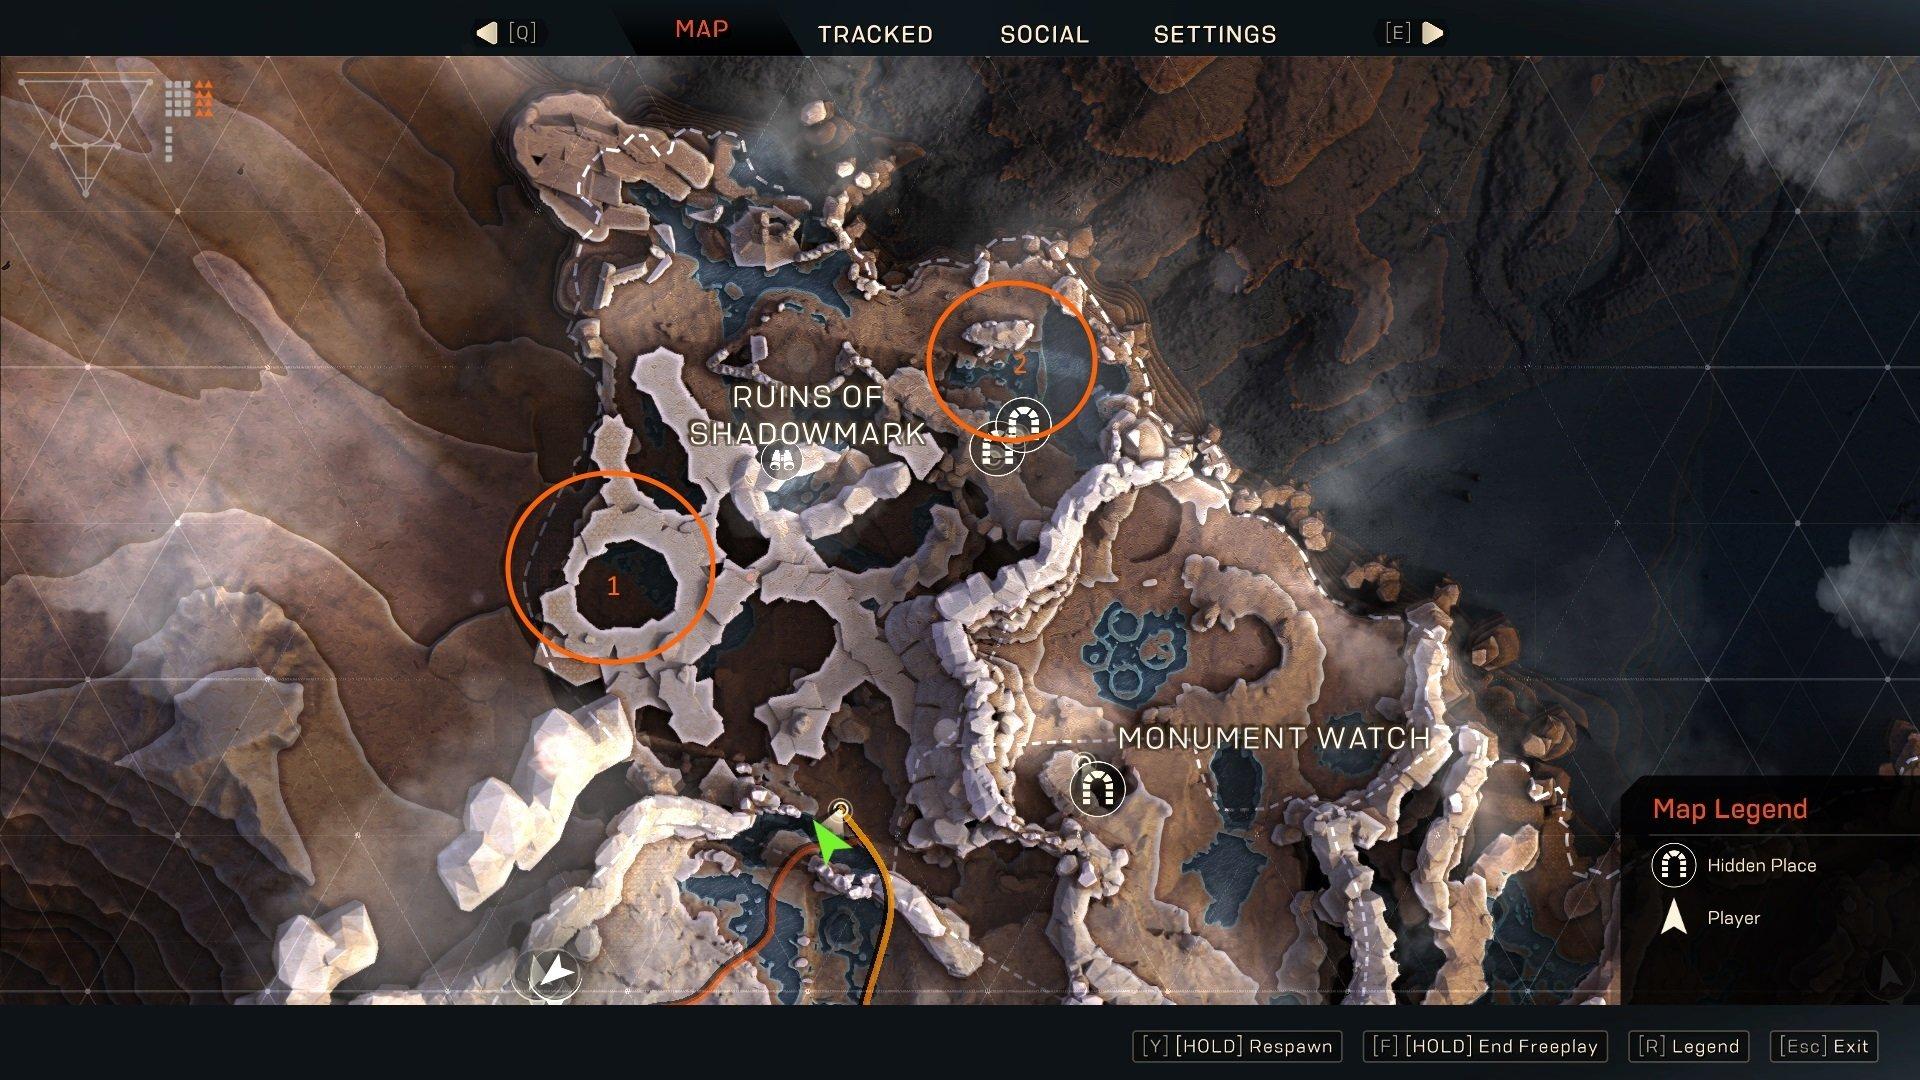 Anthem Ruins of Shadowmark World Events